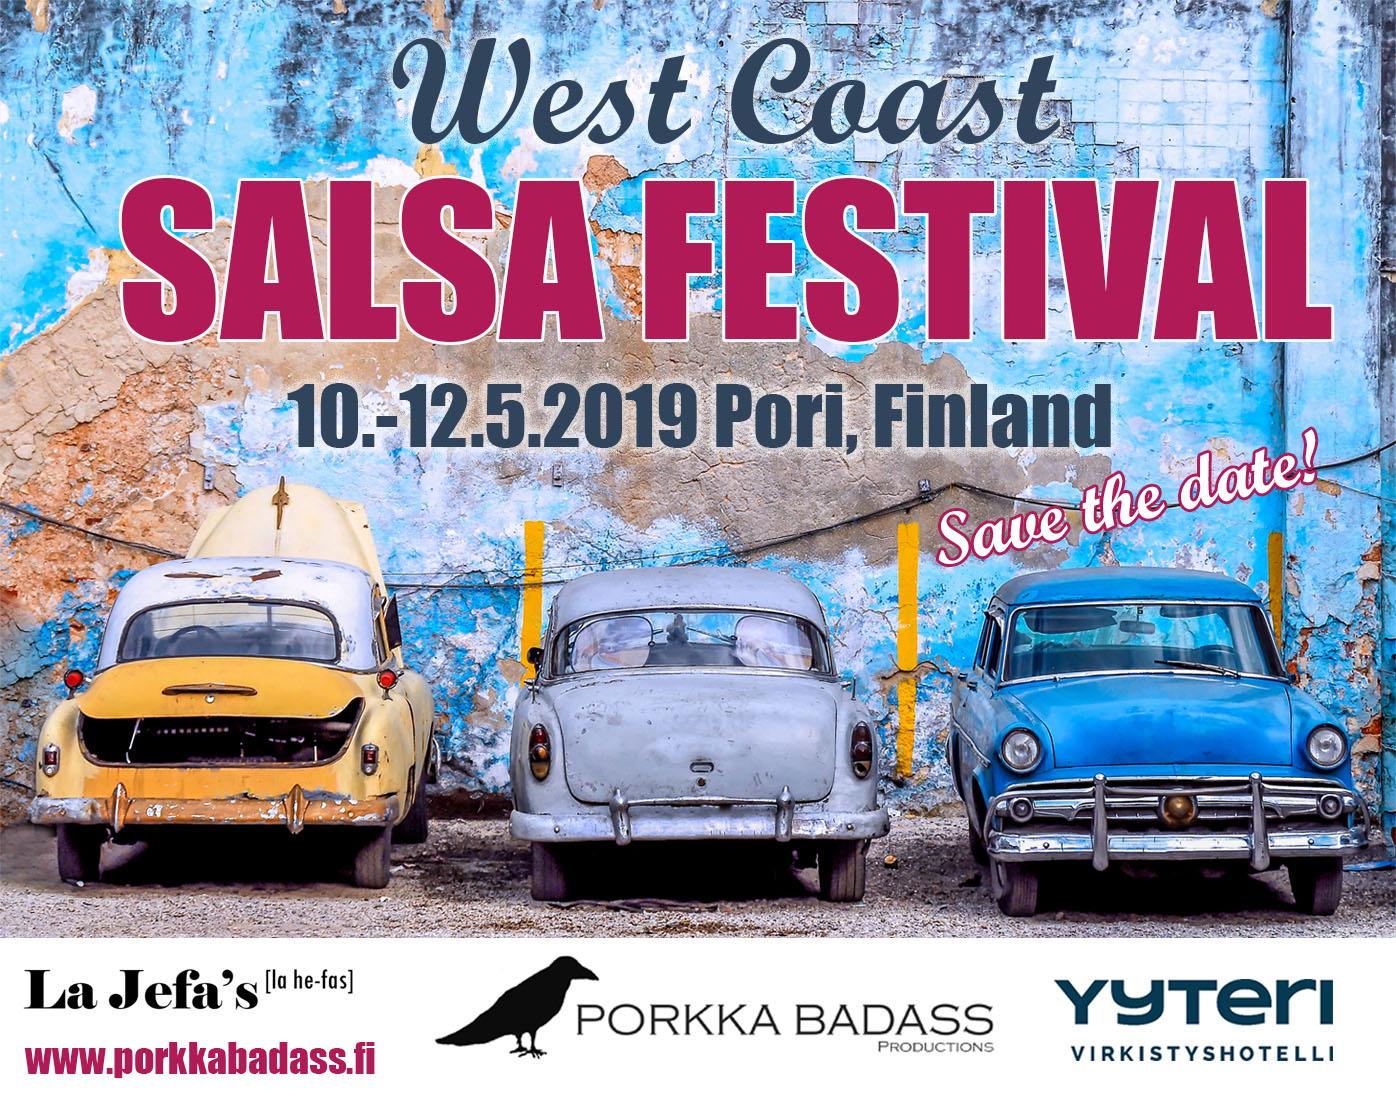 West Coast Salsa Festival